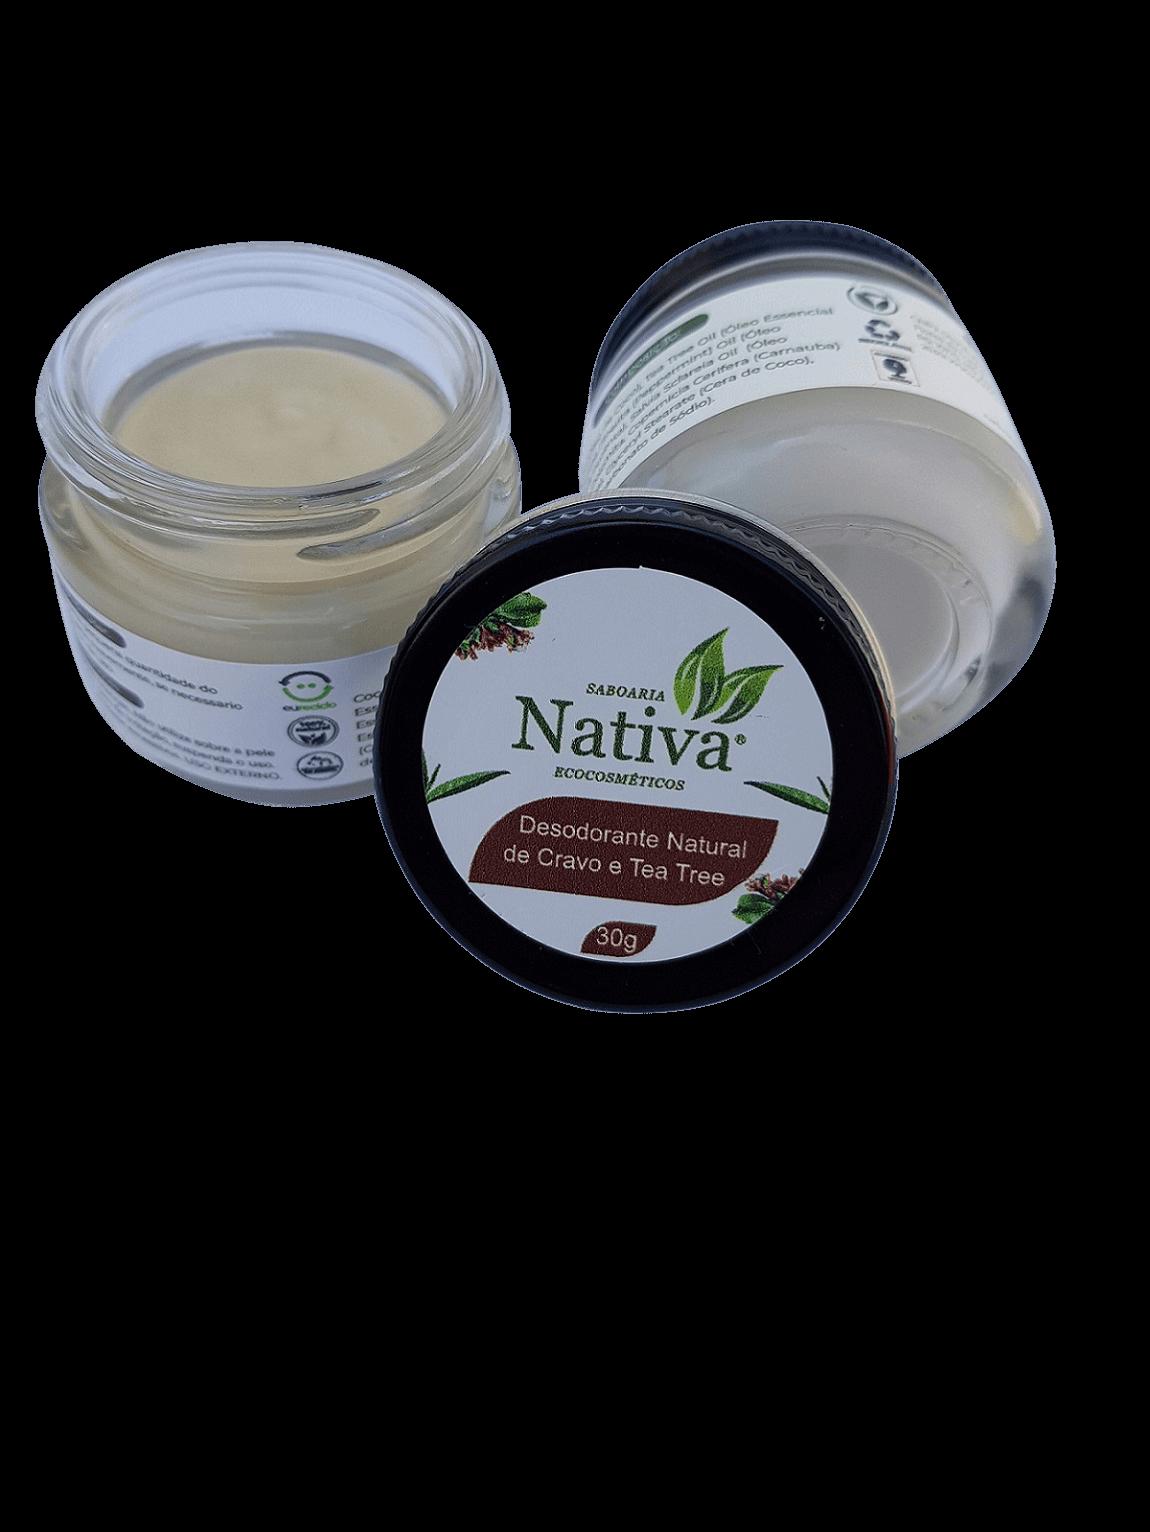 Desodorante Natural - Cravo e Tea Tree 30g  - Saboaria Nativa Ecocosméticos